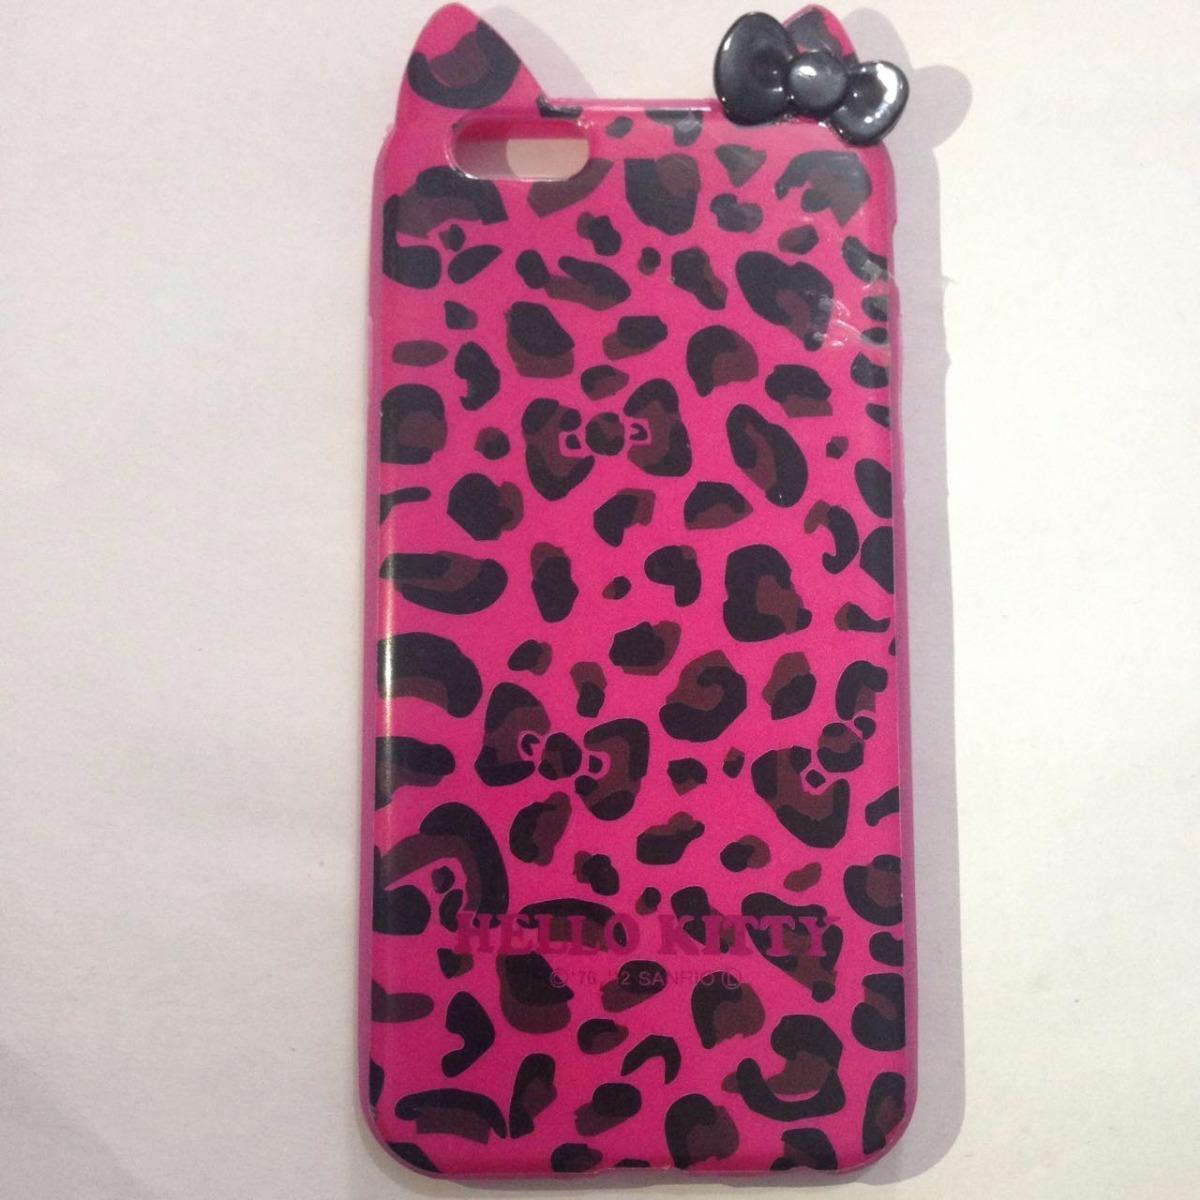 0abd6e8d4da funda / case tpu h kitty animal print para iphone 6 / 6s. Cargando zoom.